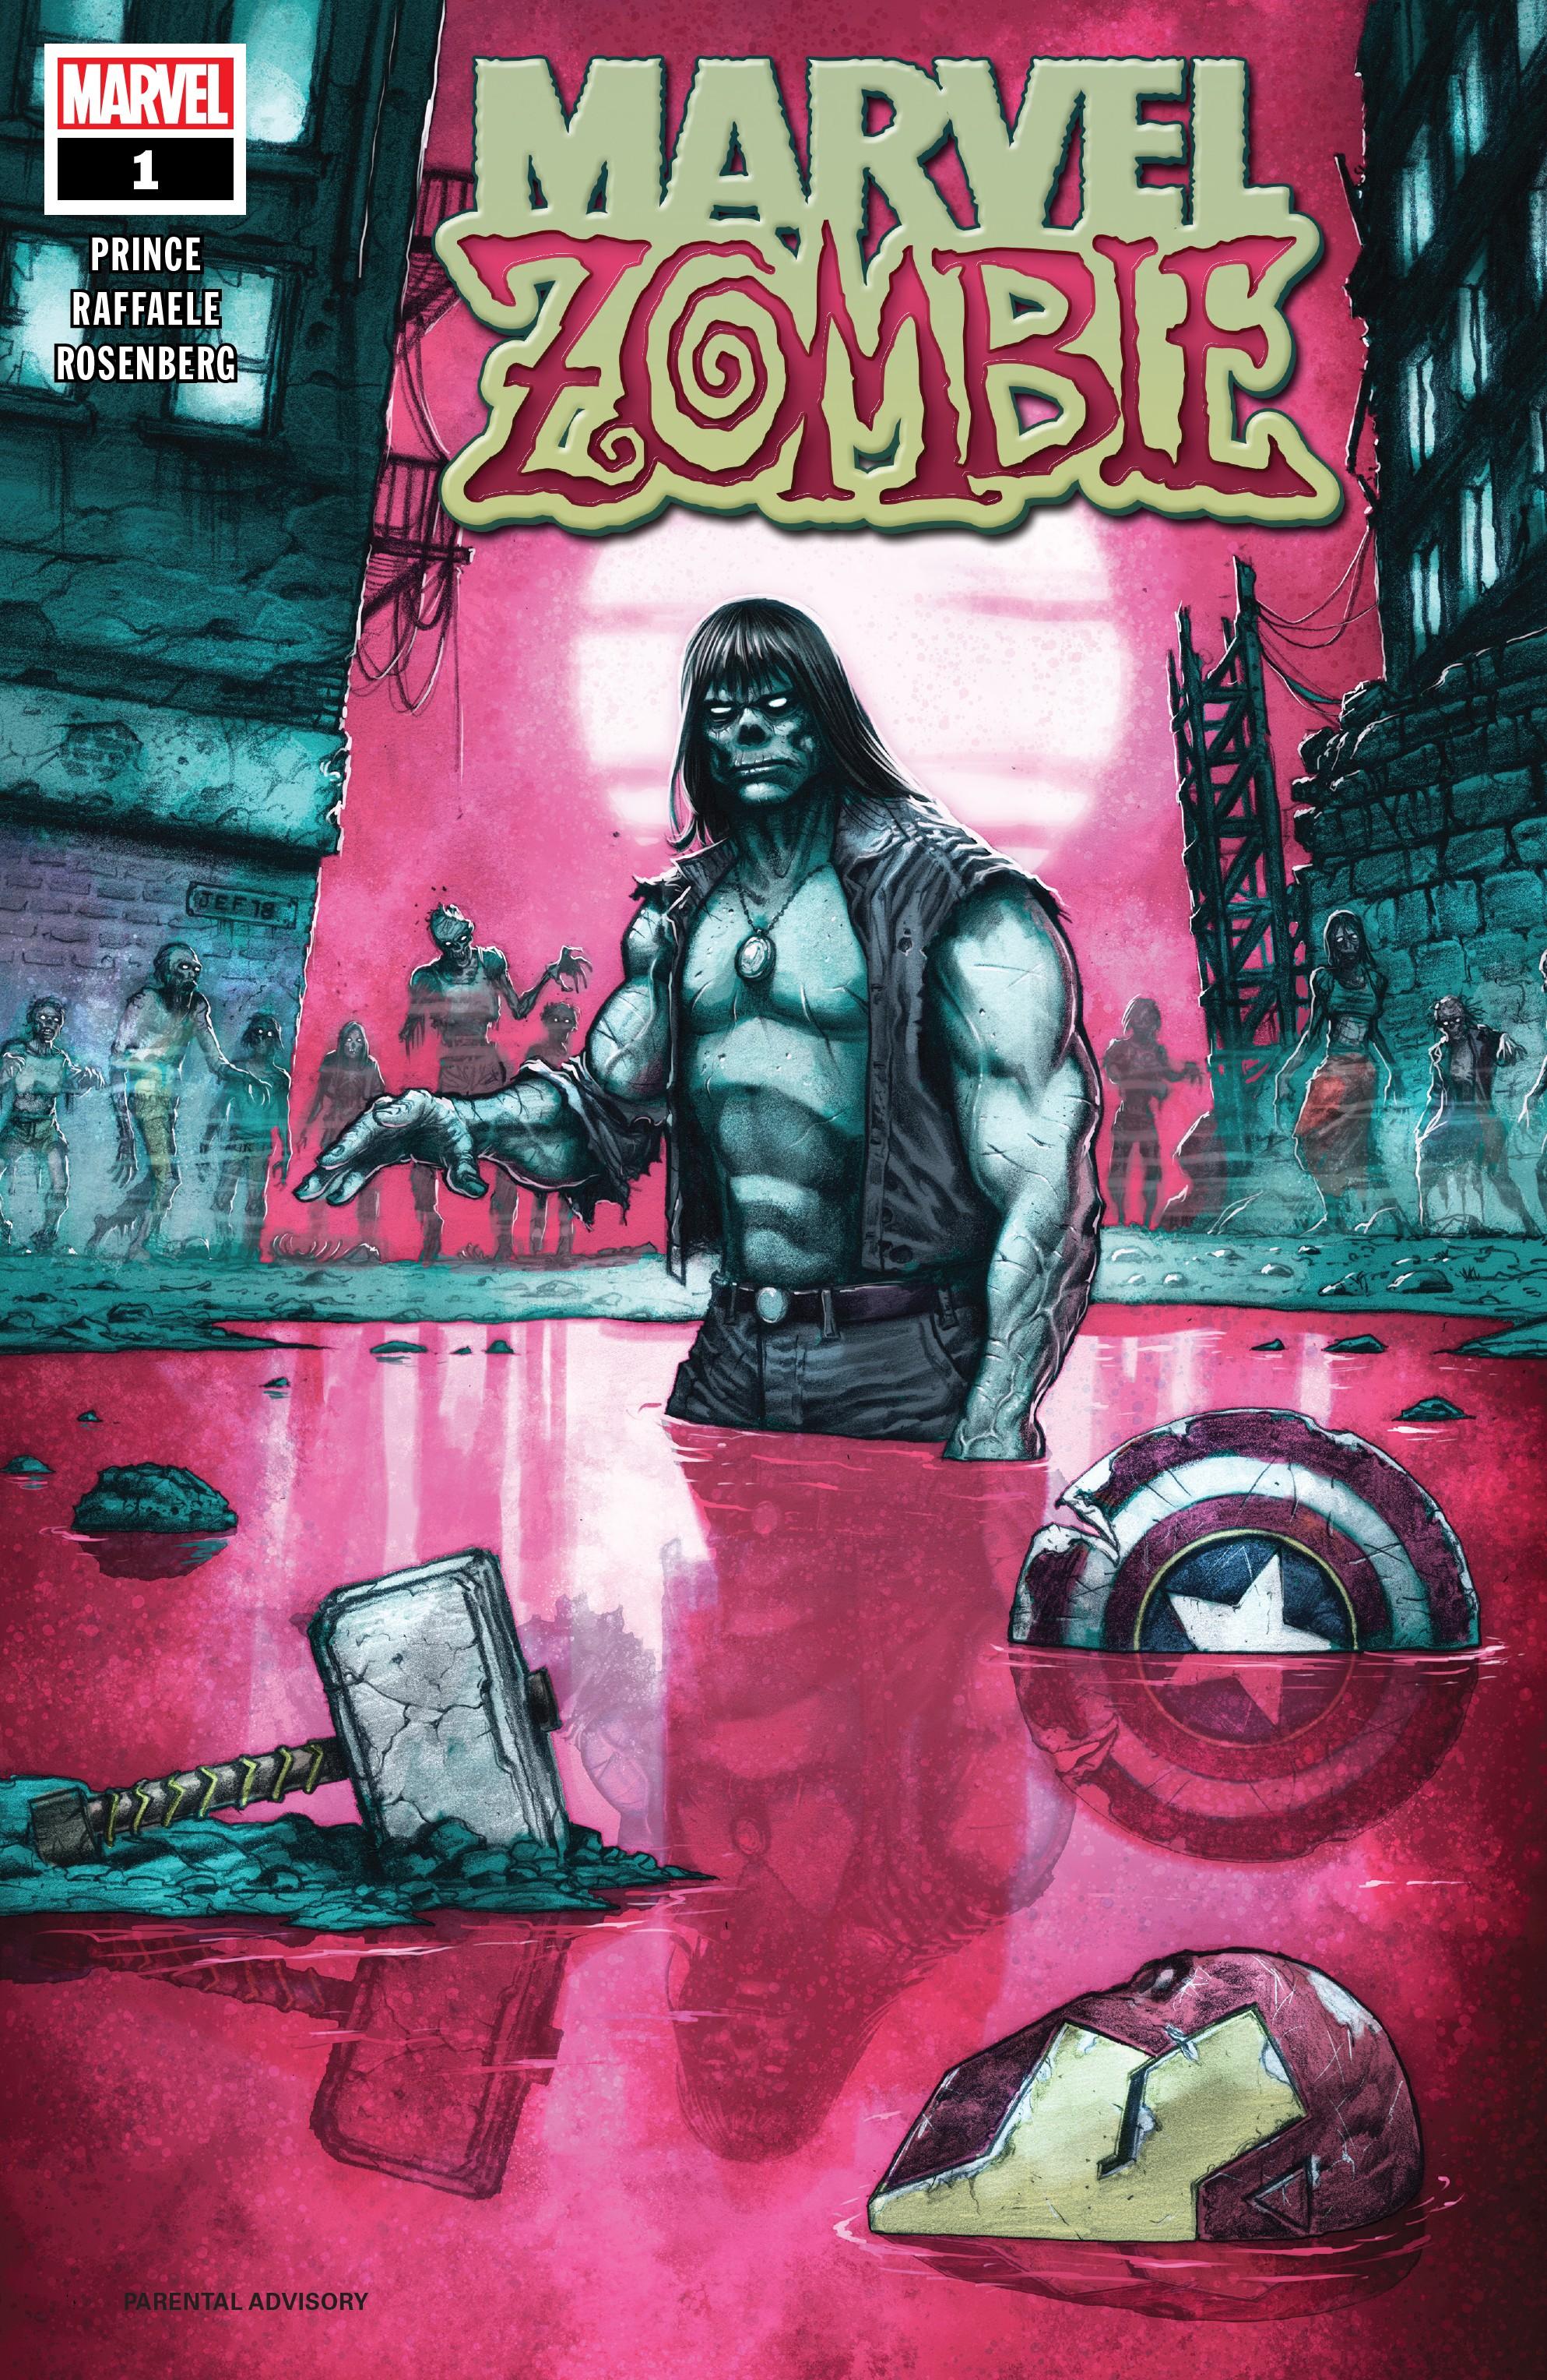 Marvel Zombie #1 cover